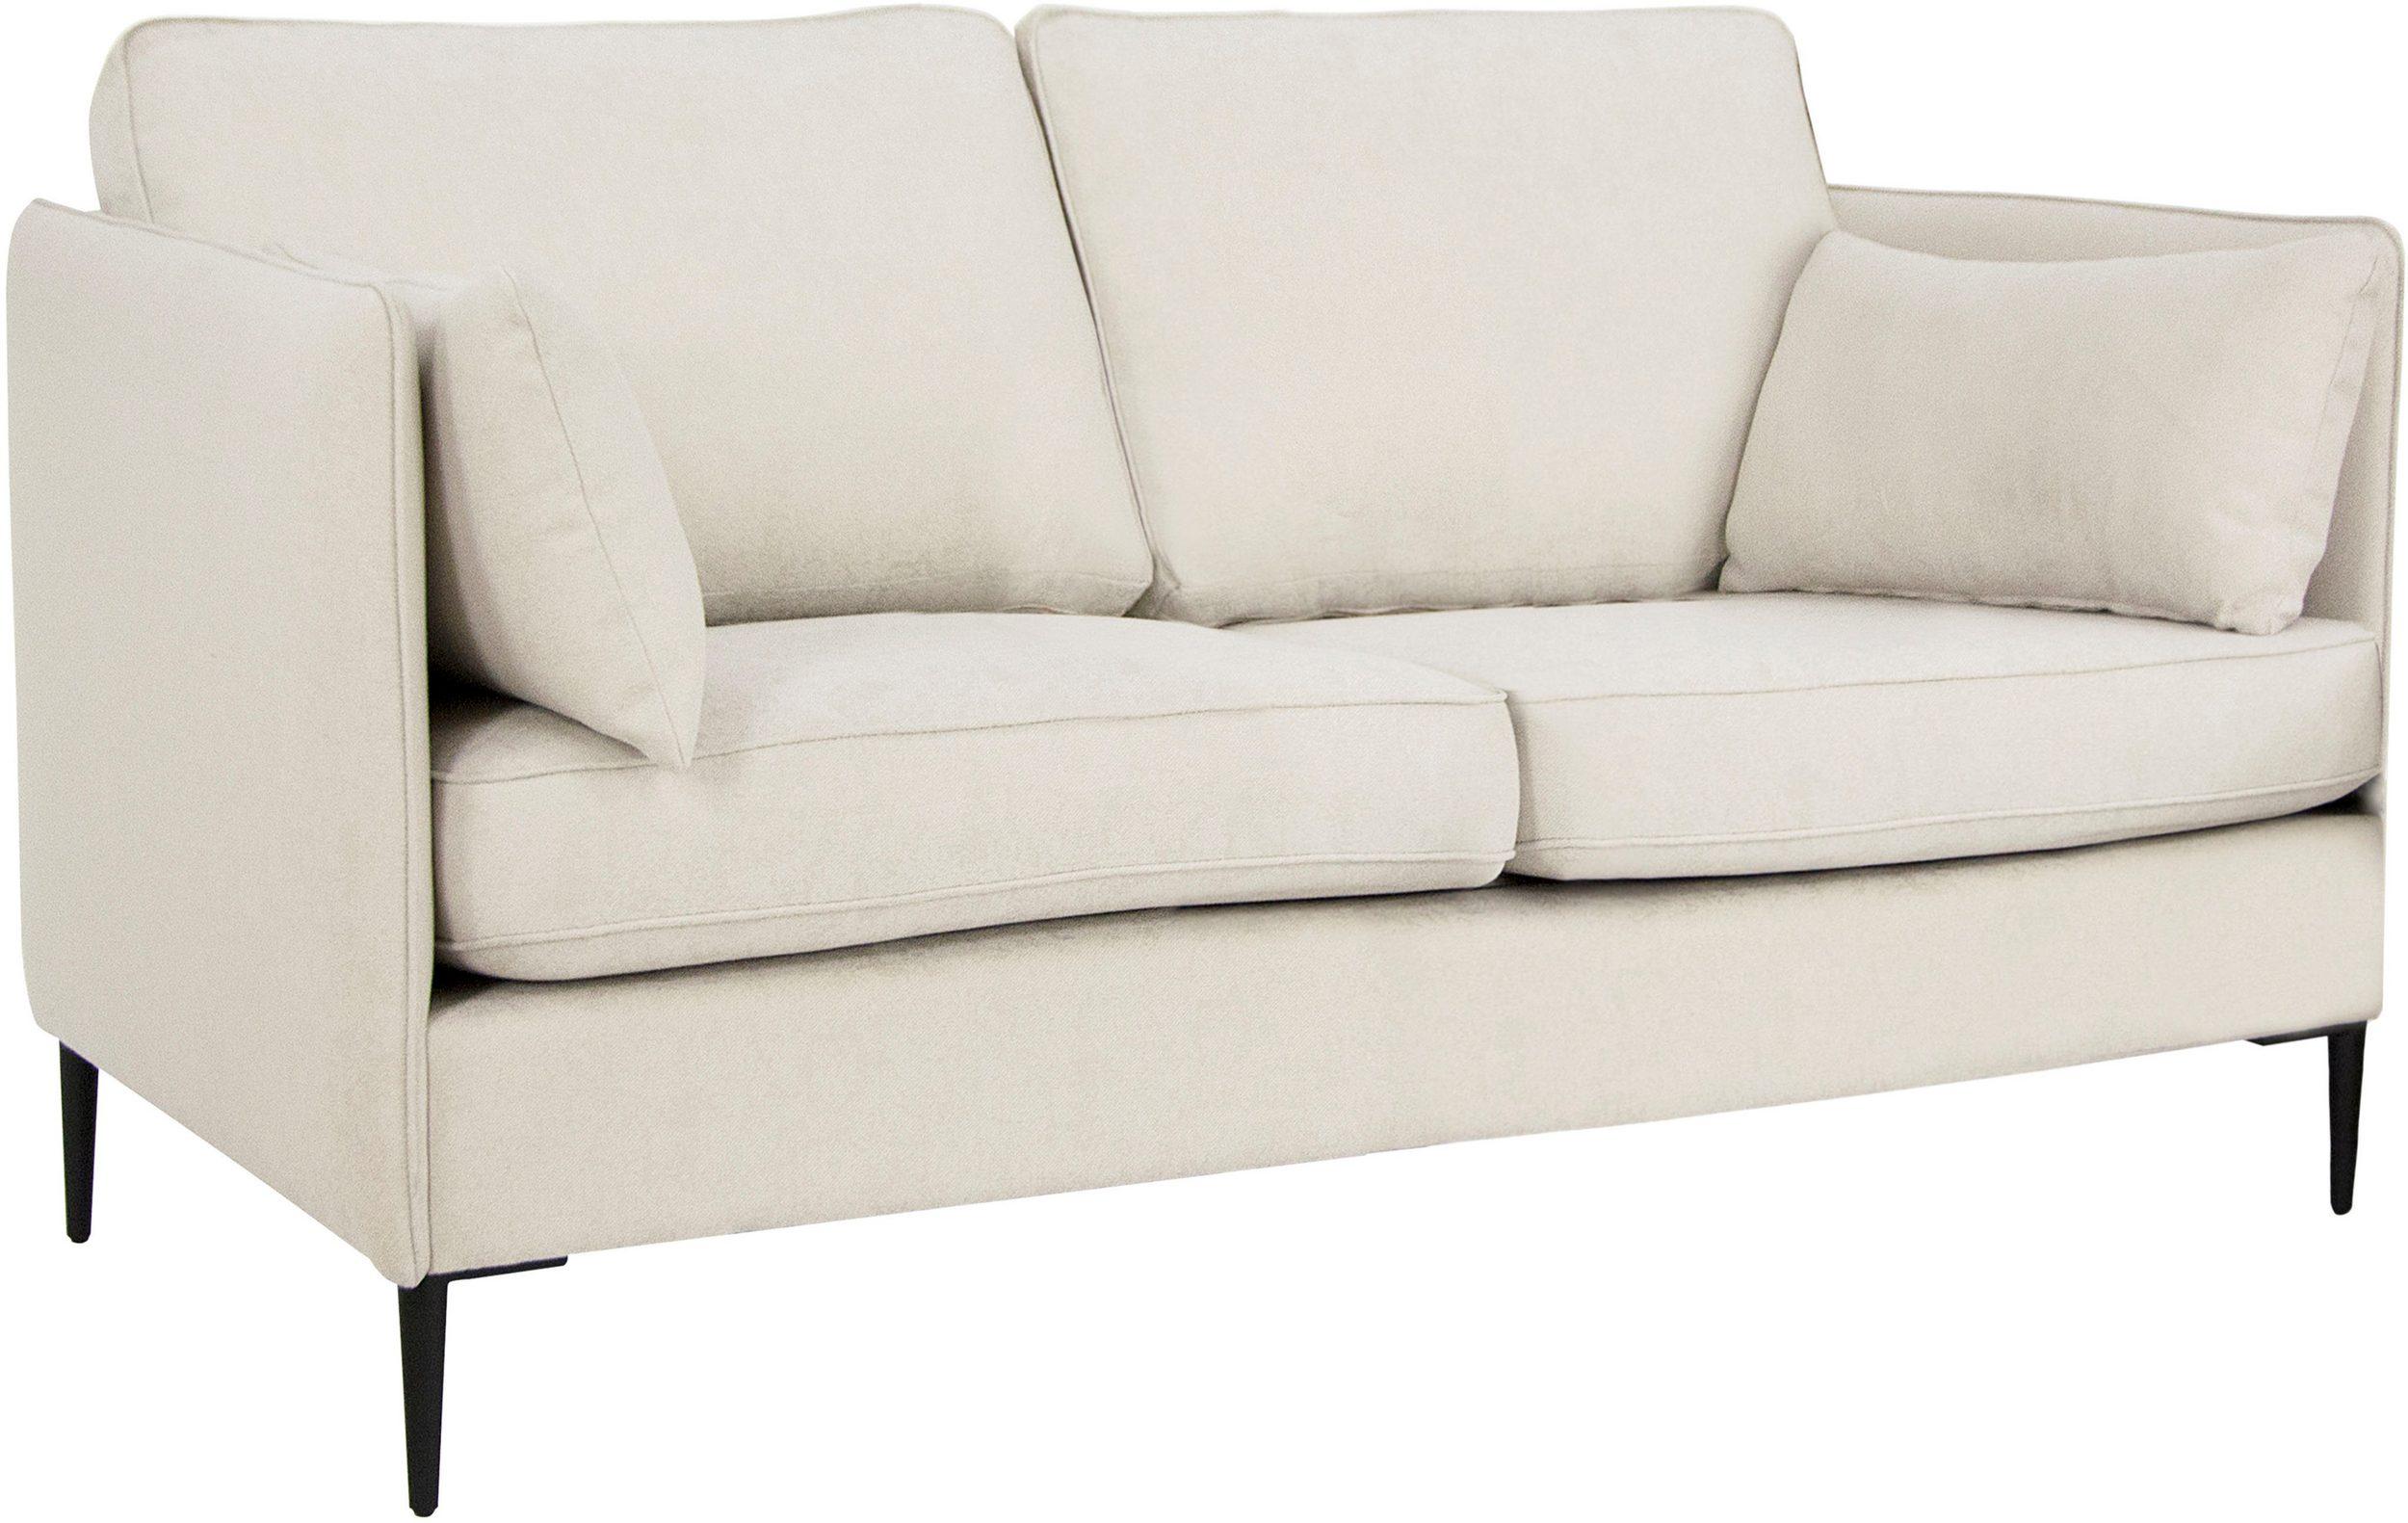 2-Sitzer Sofa Light